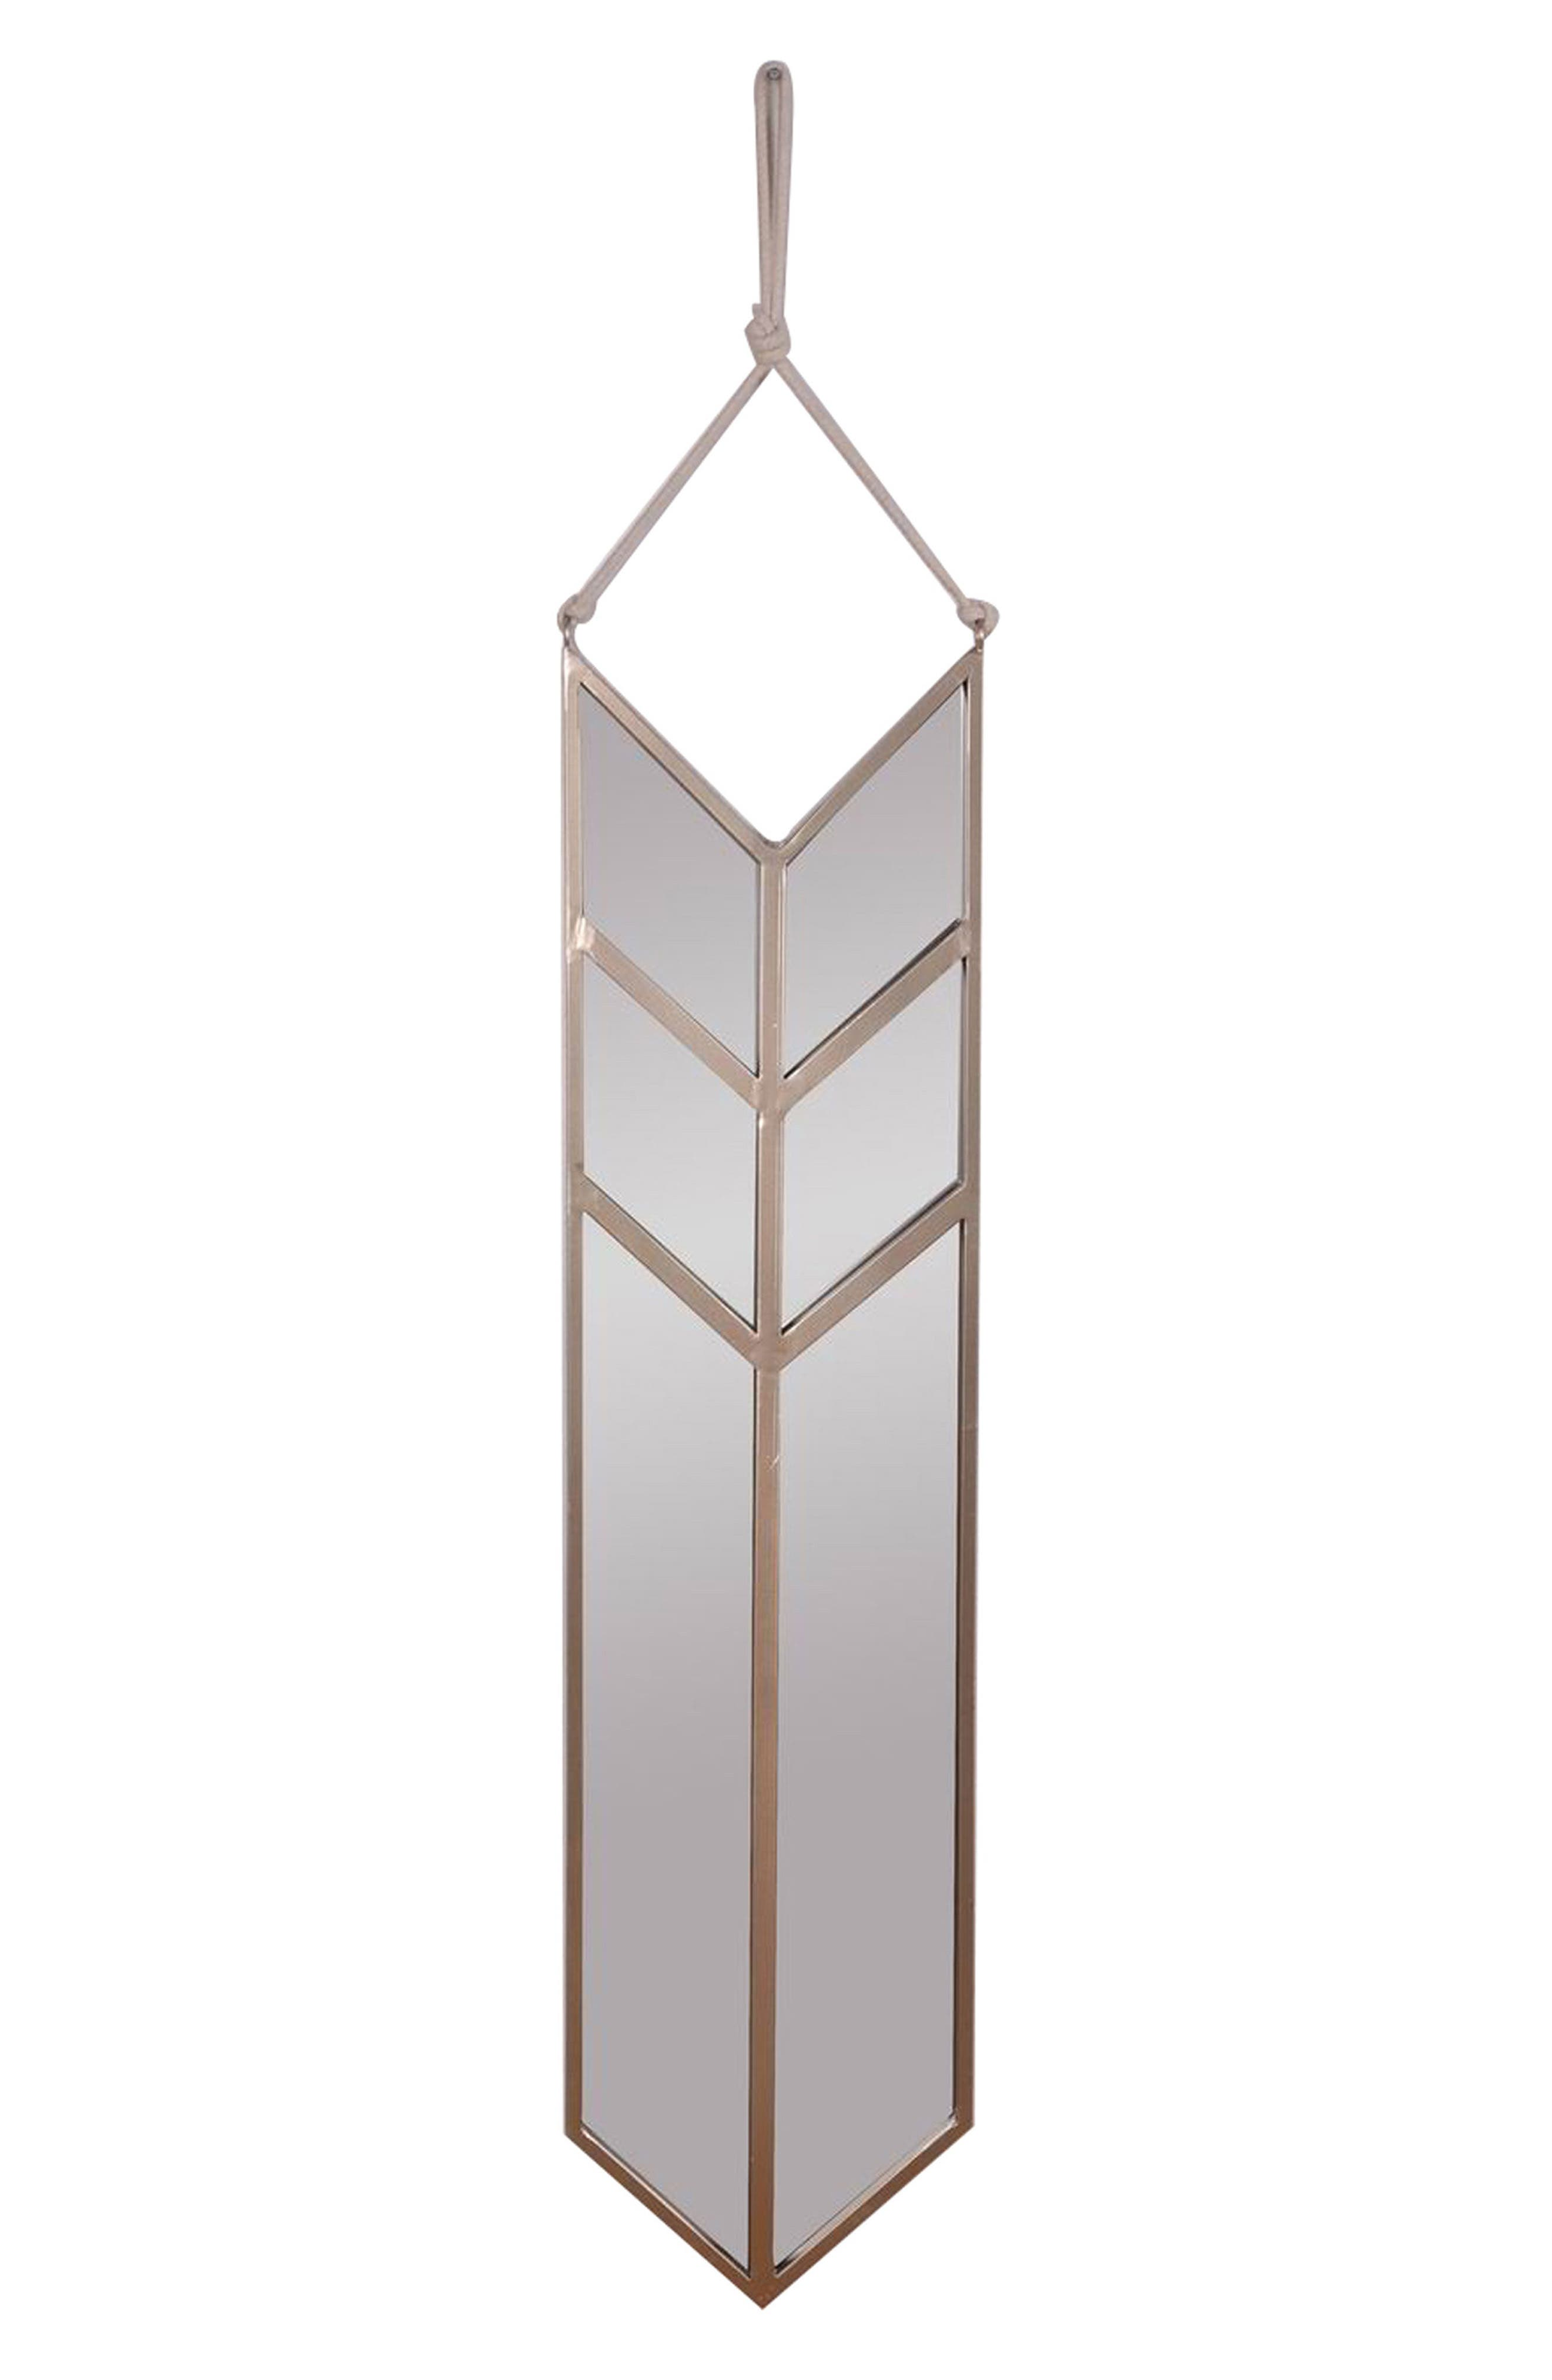 Crystal Art Gallery Festival Mirror